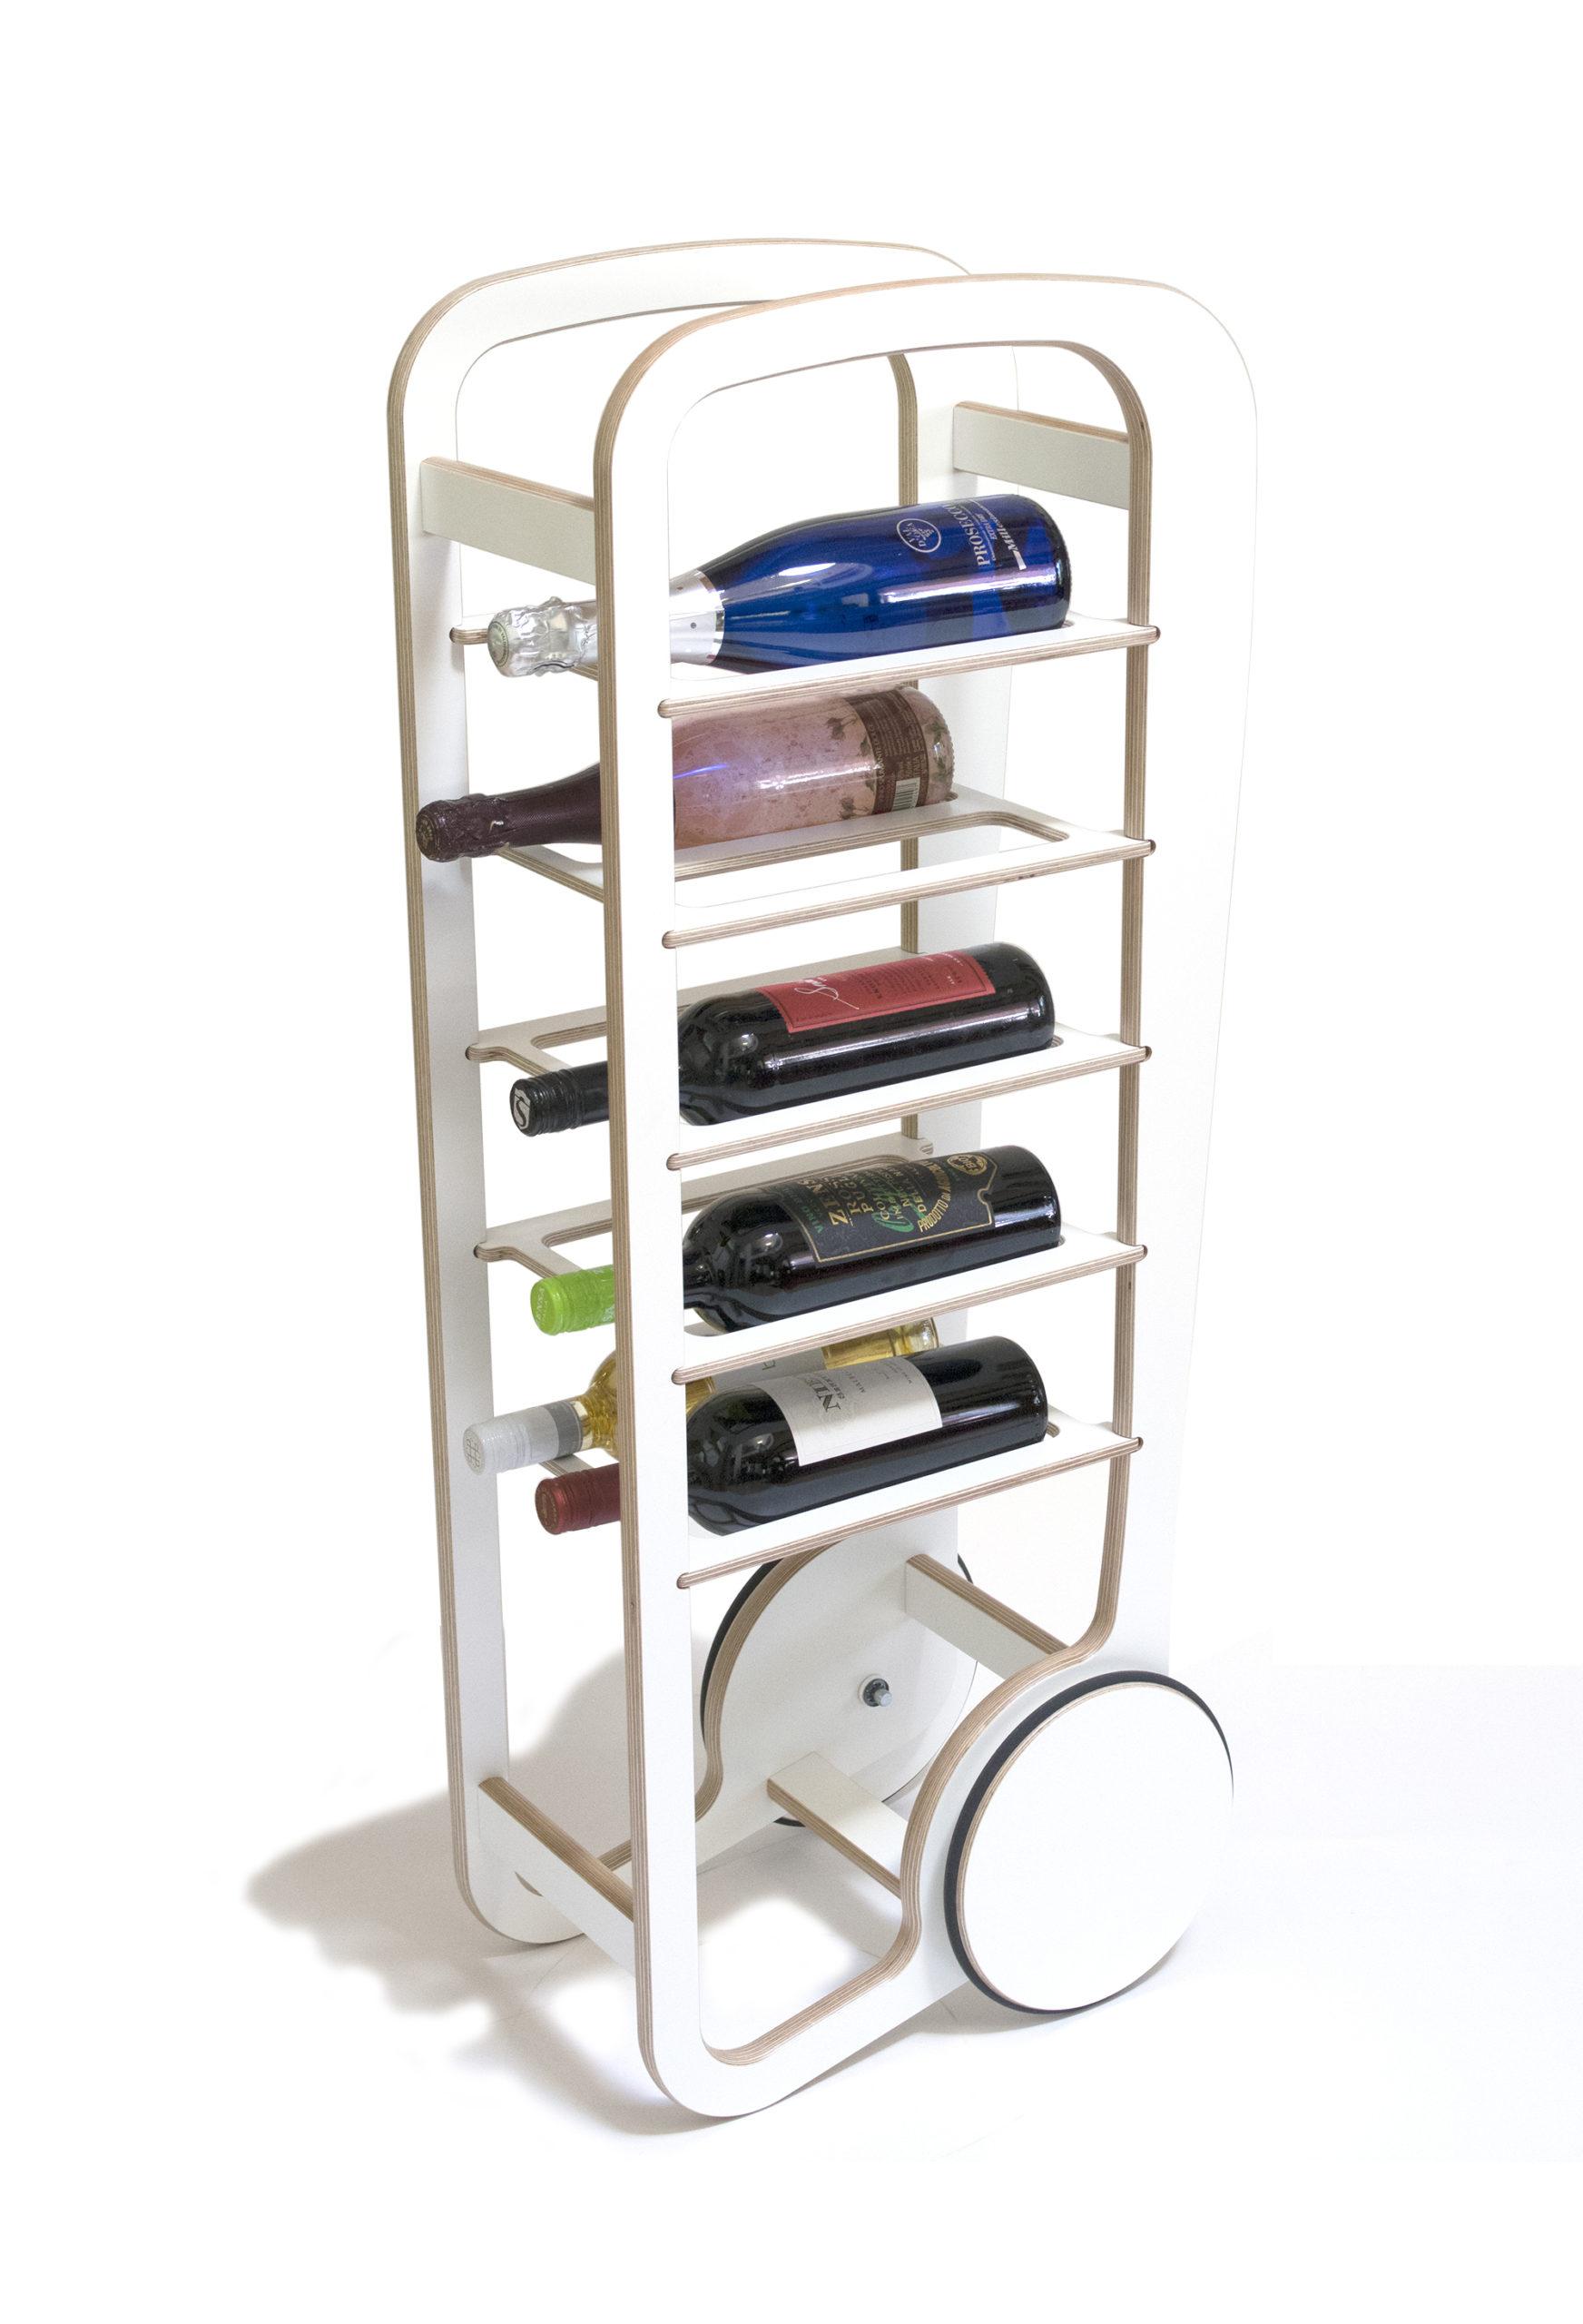 fleimio wine trolley white with wine bottles